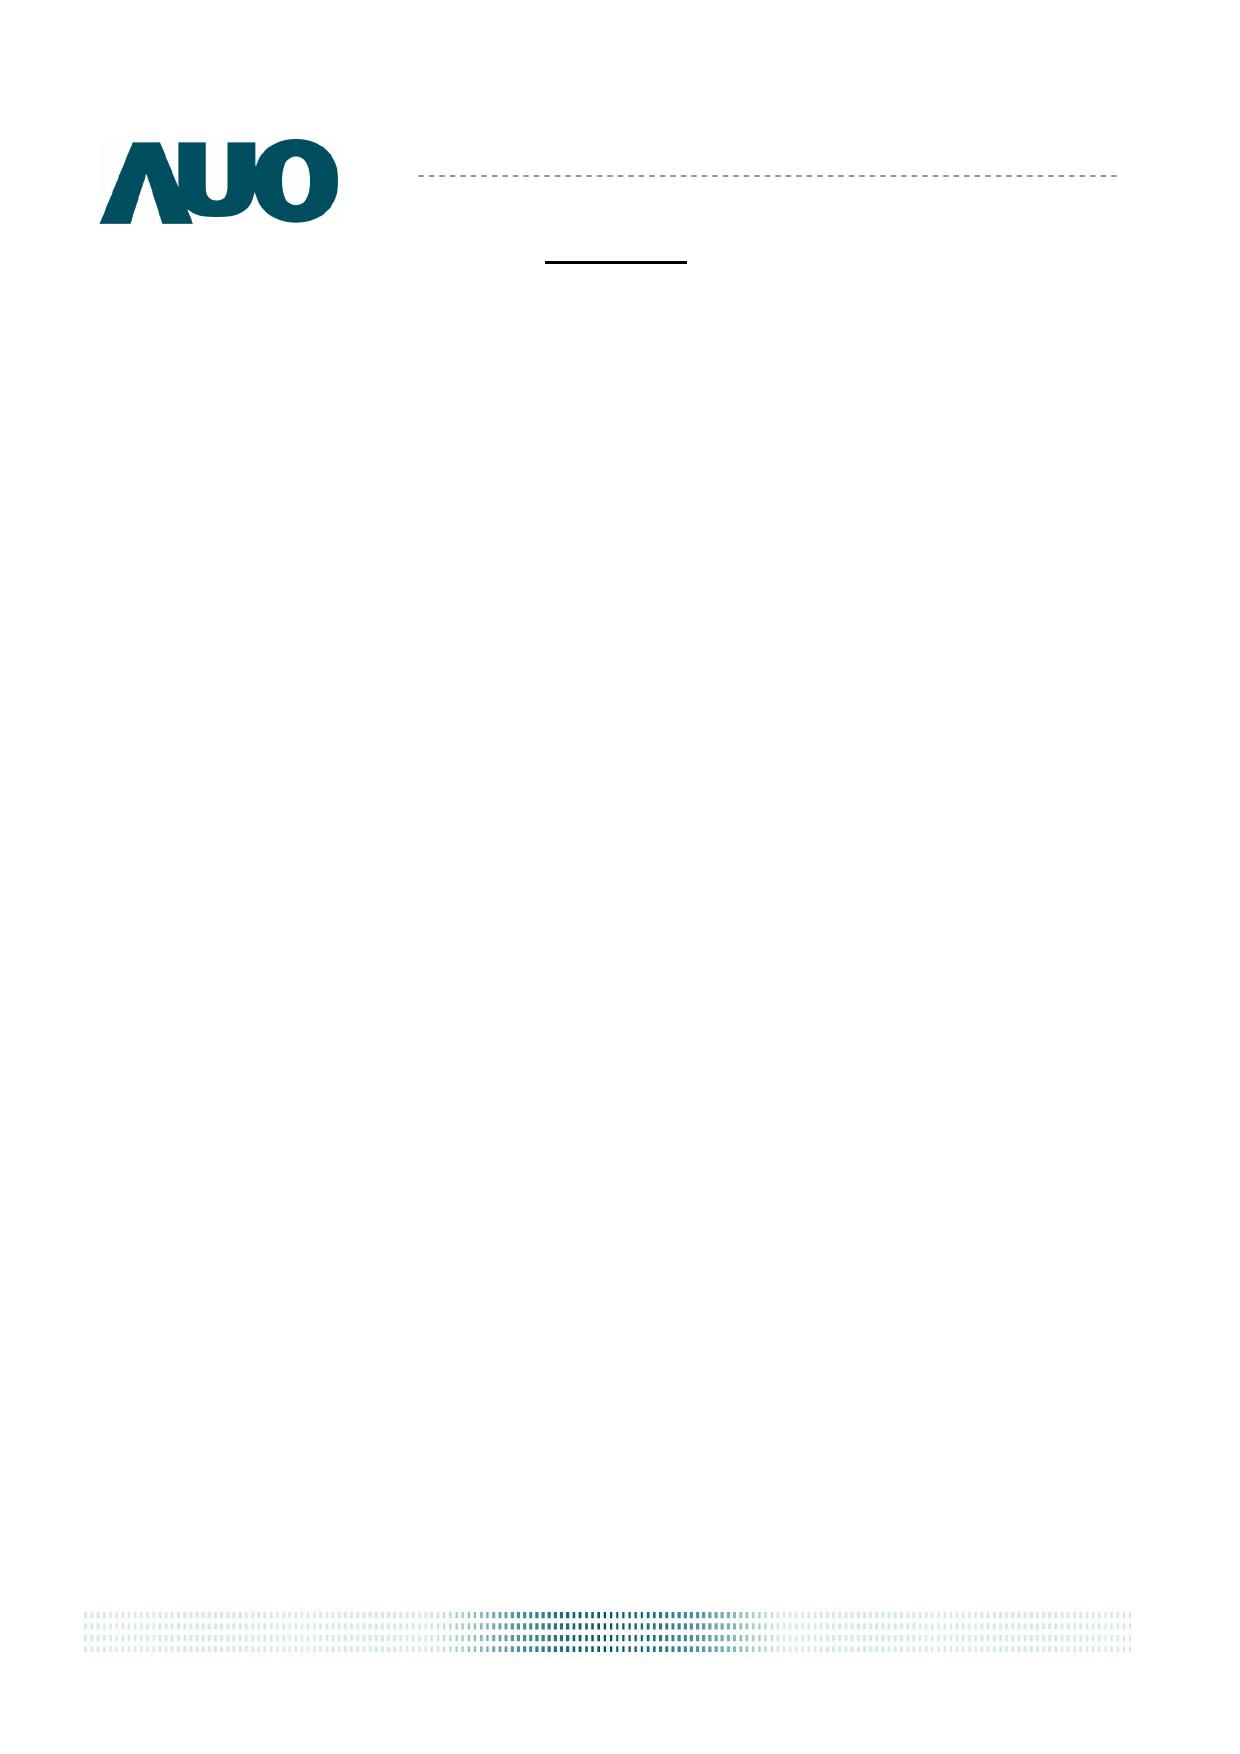 G070VTN01.0 Даташит, Описание, Даташиты